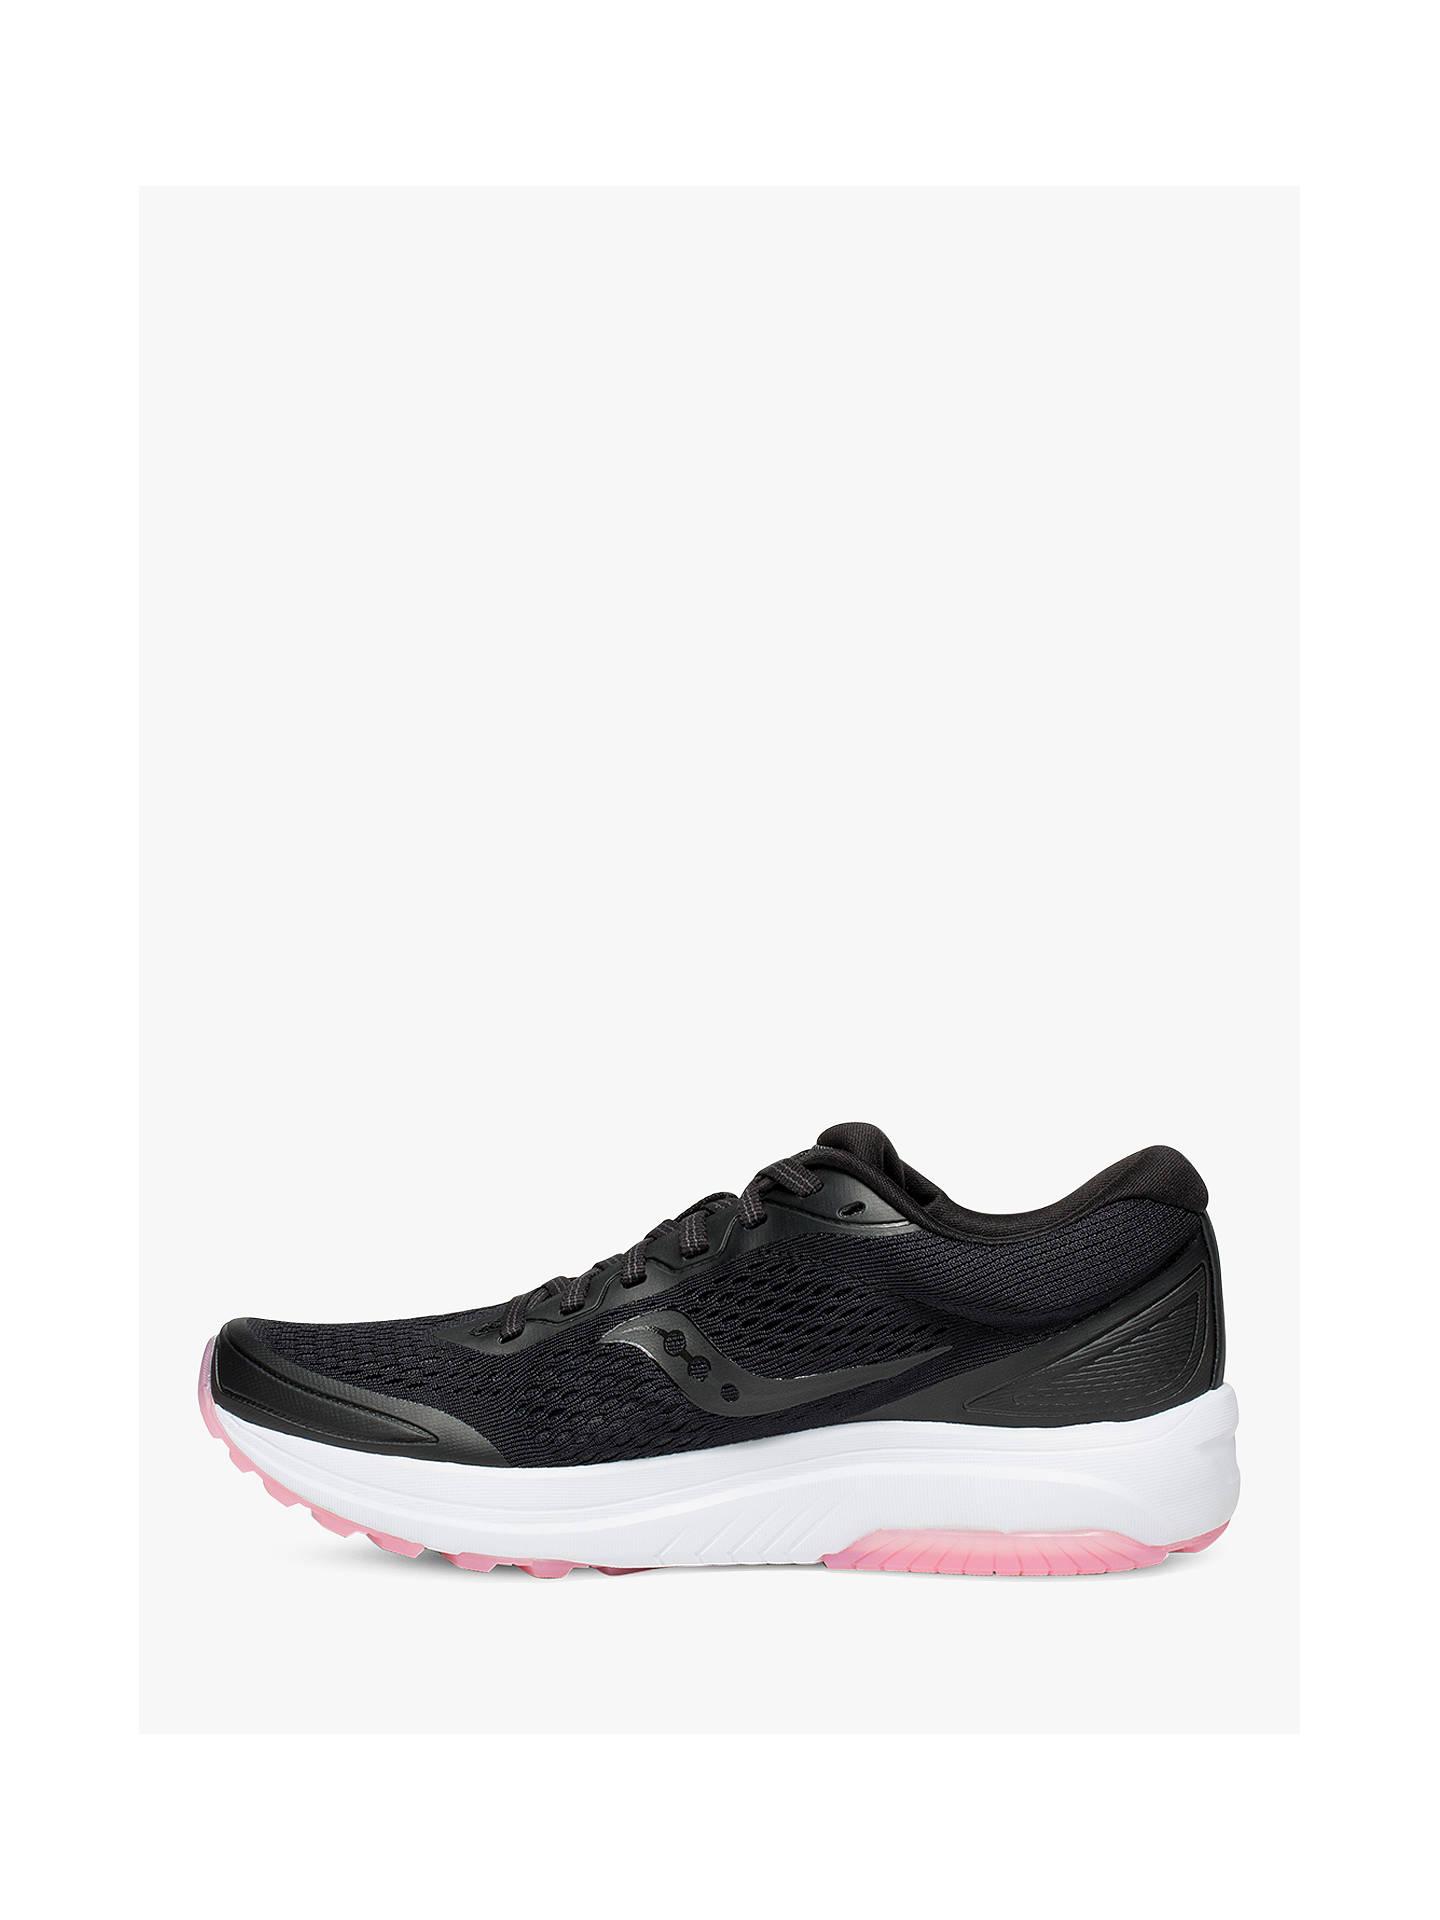 b60b741b1a Saucony Clarion Women's Running Shoes, Black